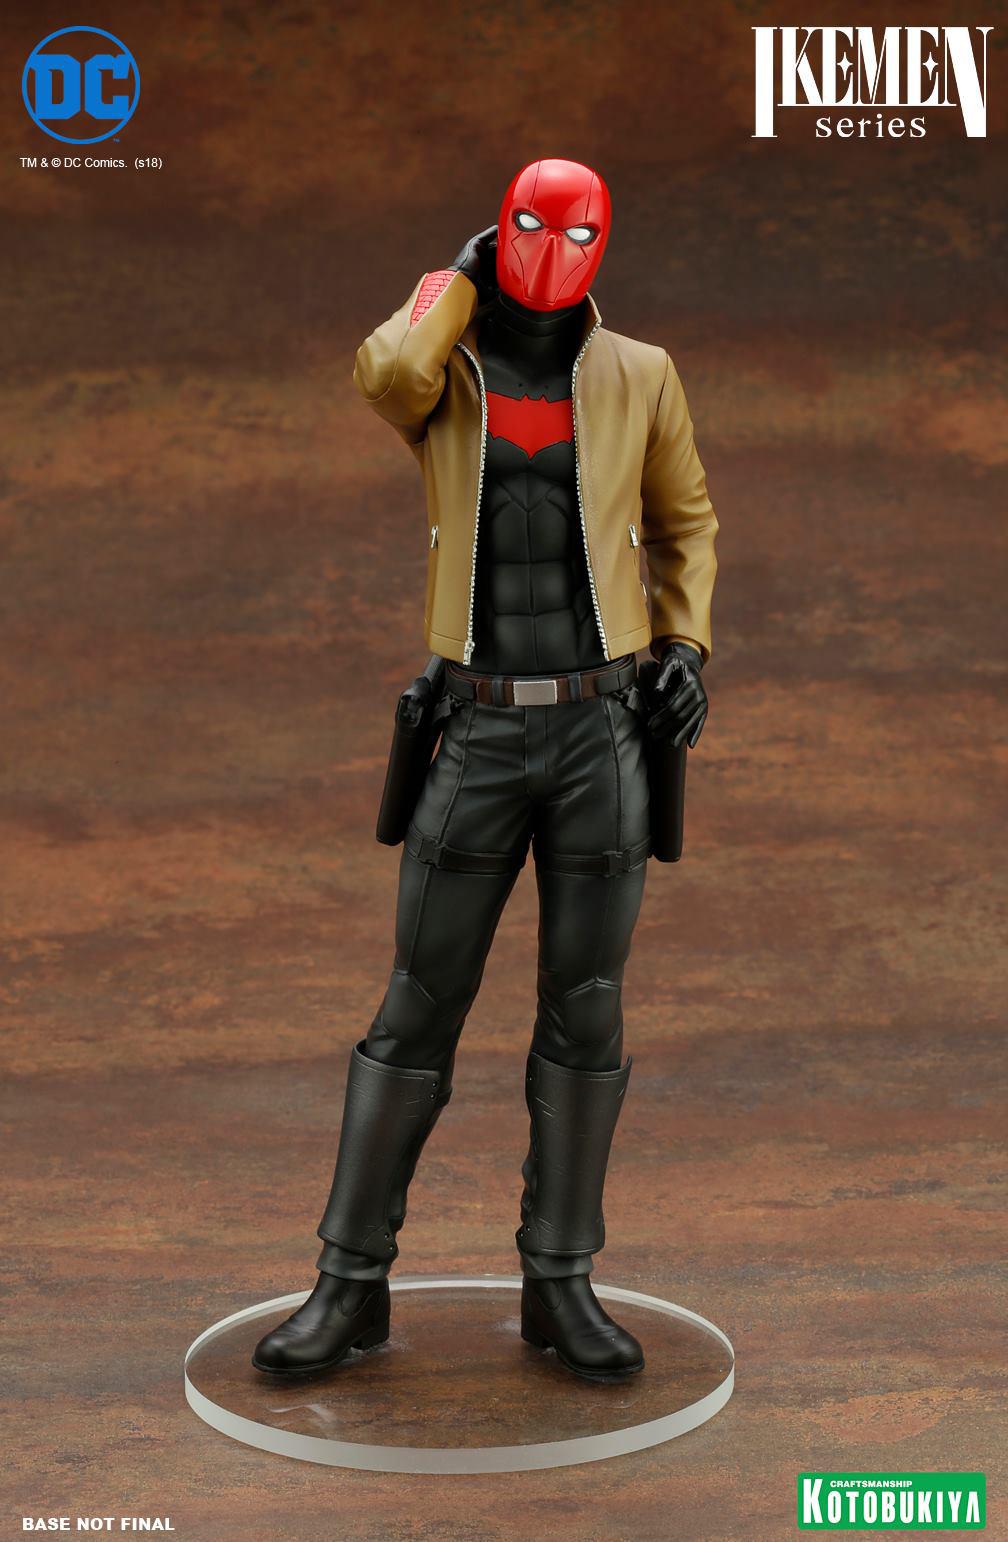 kotobukiya-dc-comics-red-hood-ikemen-statue-7